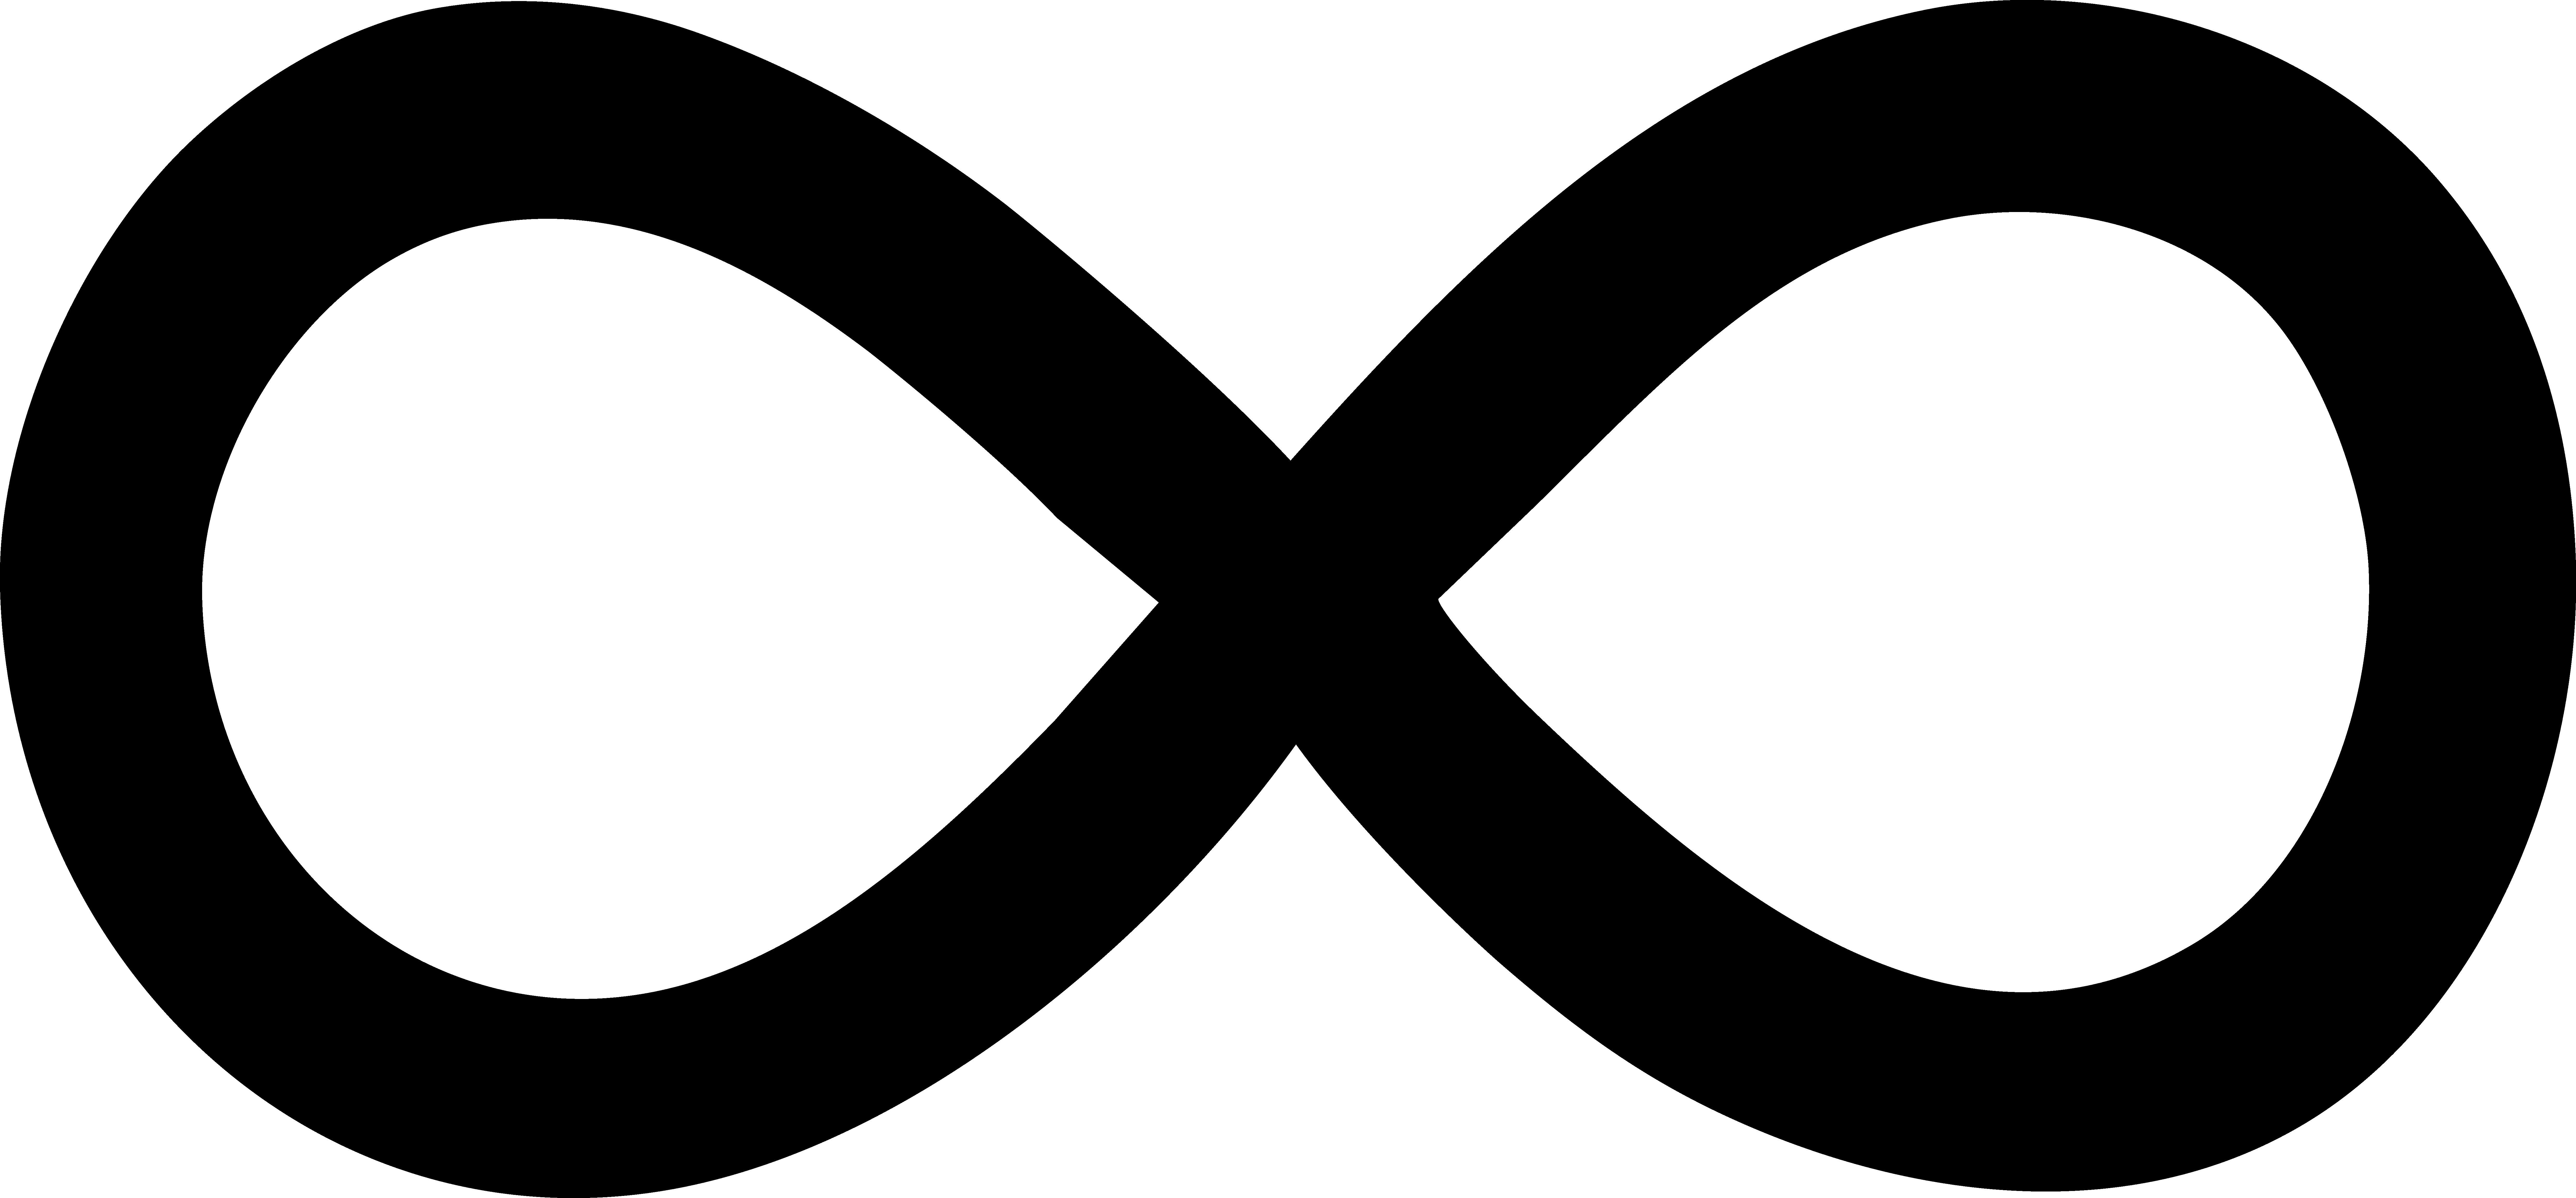 Simple Black Infinity Symbol.